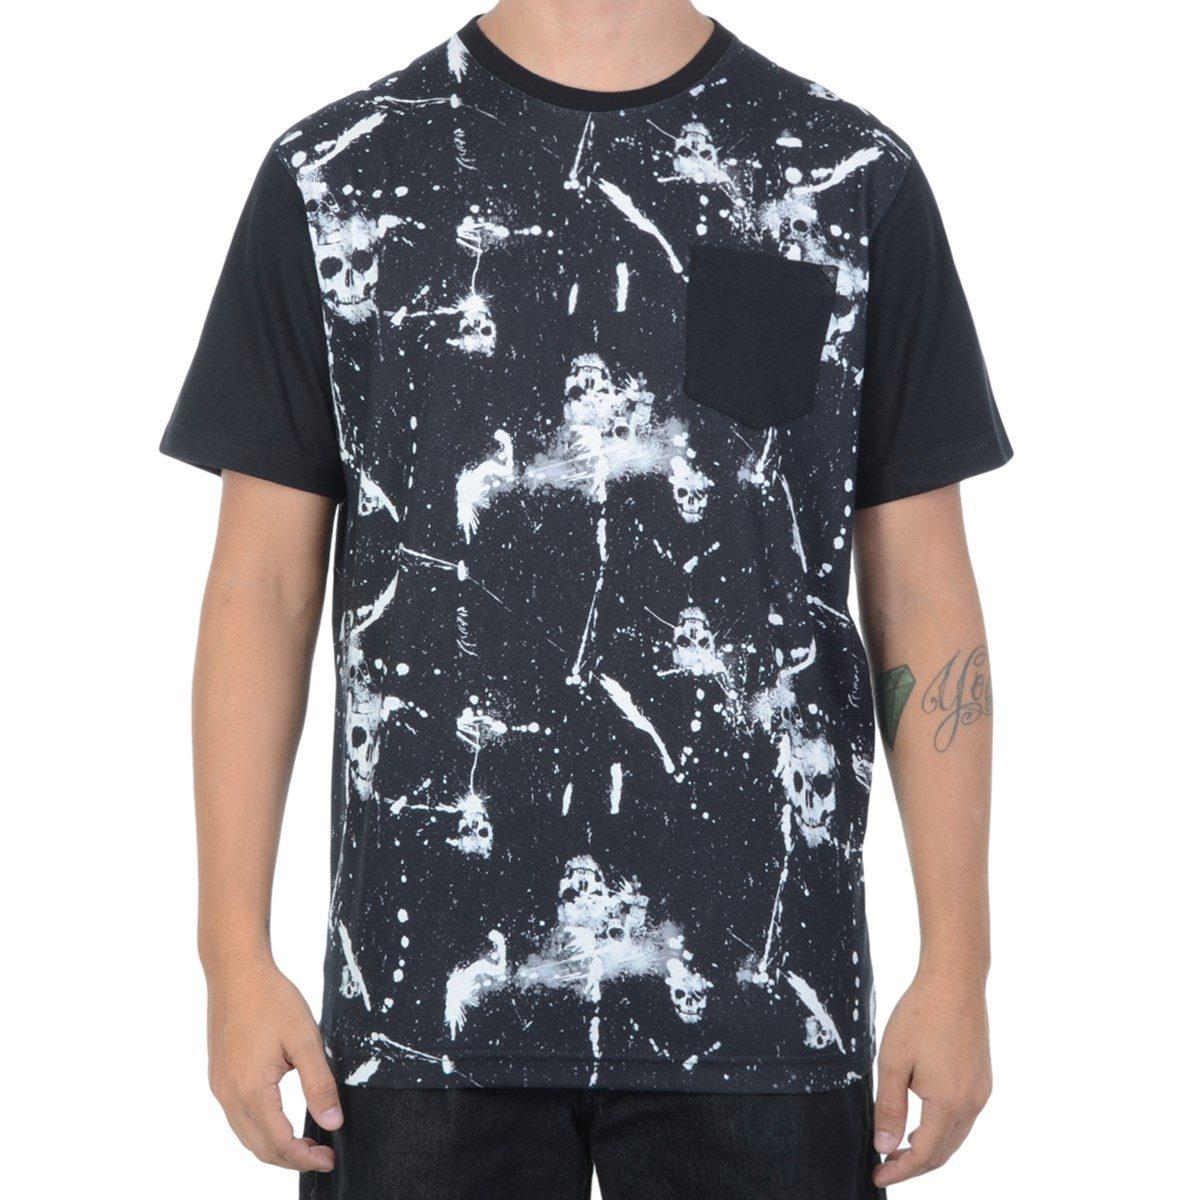 camiseta masculina mcd especial grunge skull preta. Carregando zoom. 357f49d67c1